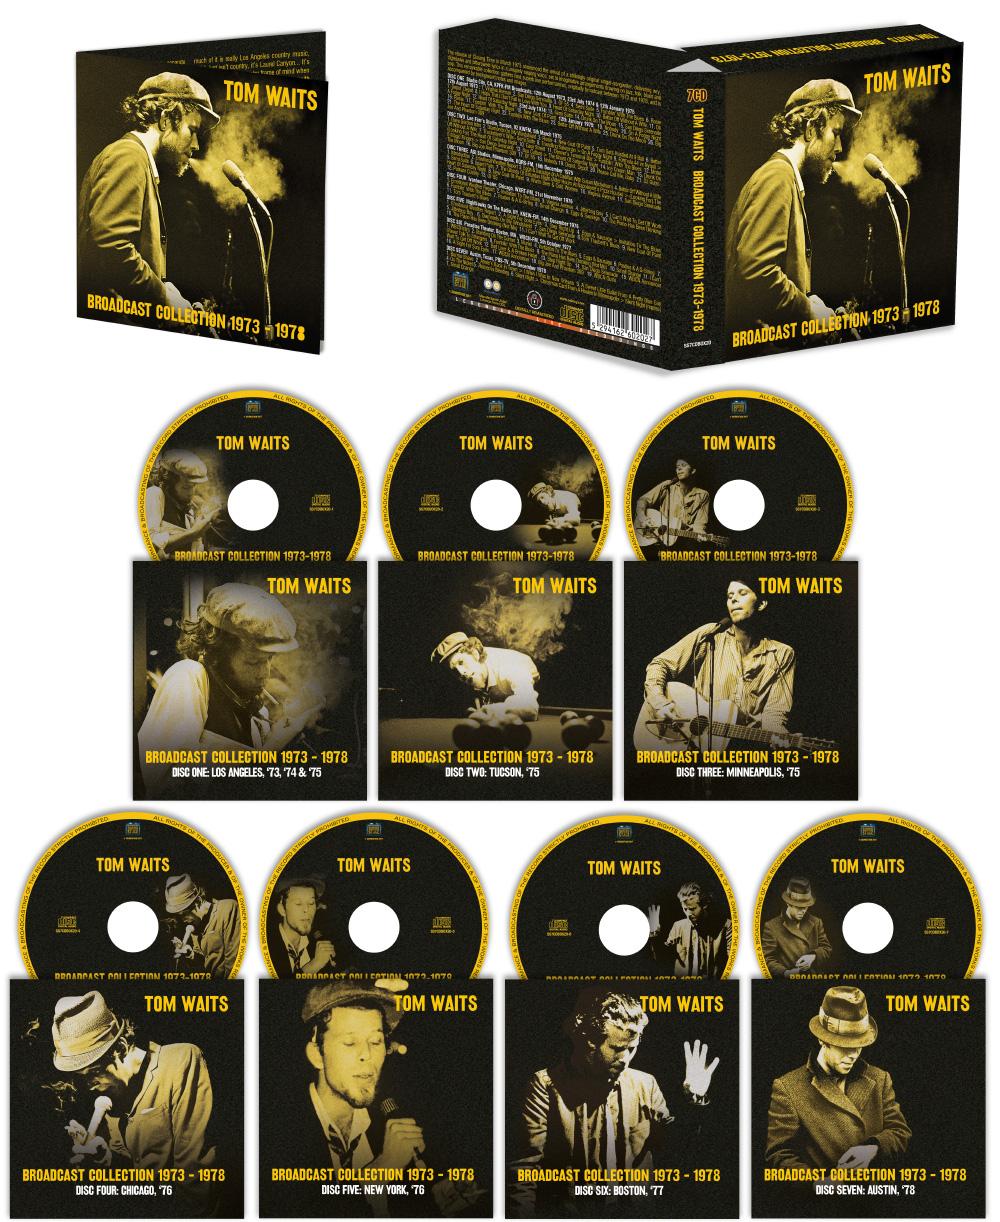 7CD Tom Waits Boxset